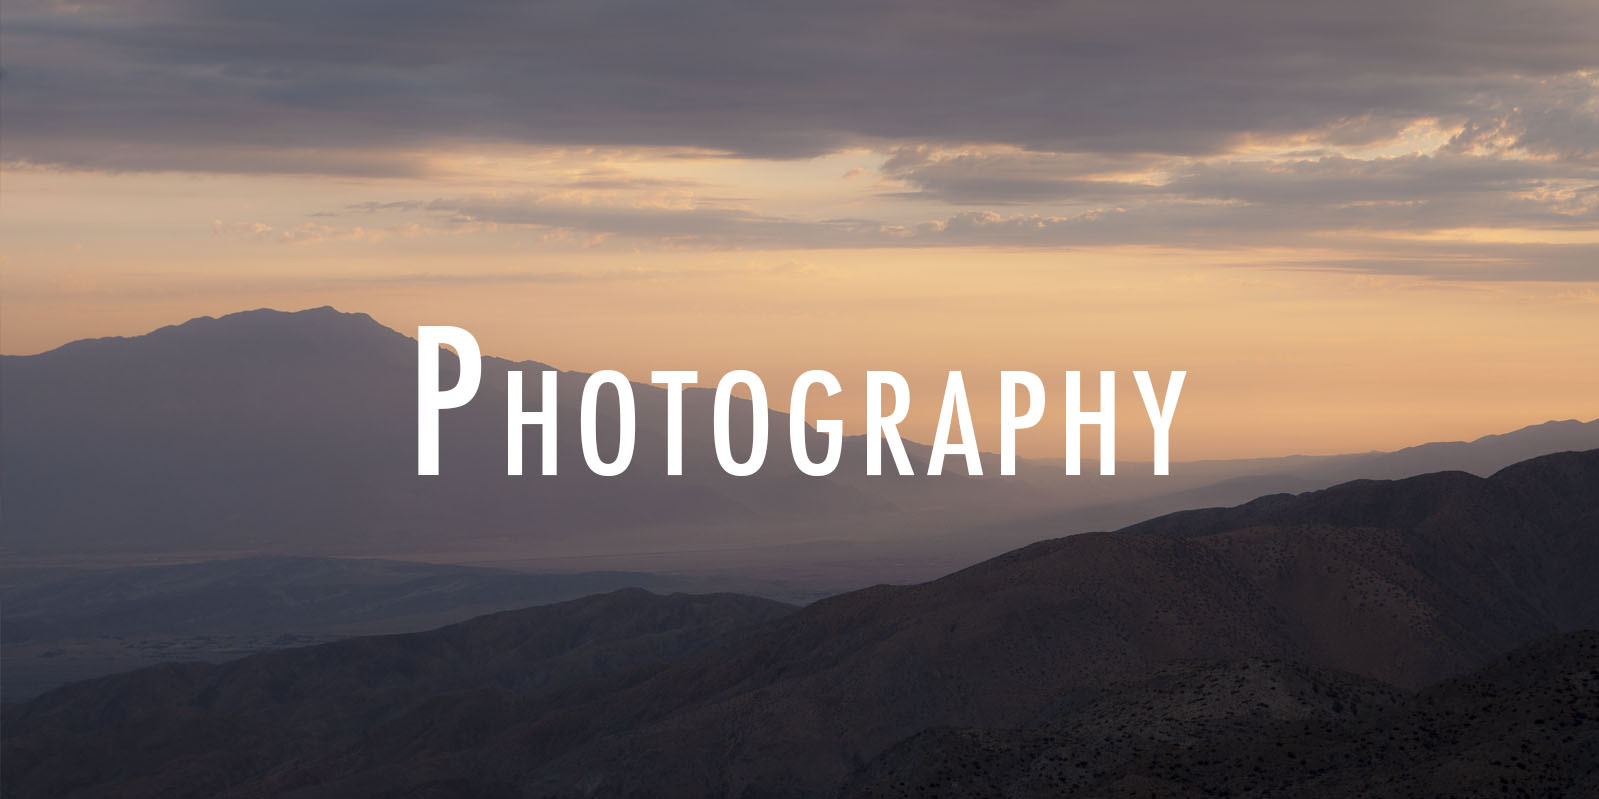 photography-link.jpg